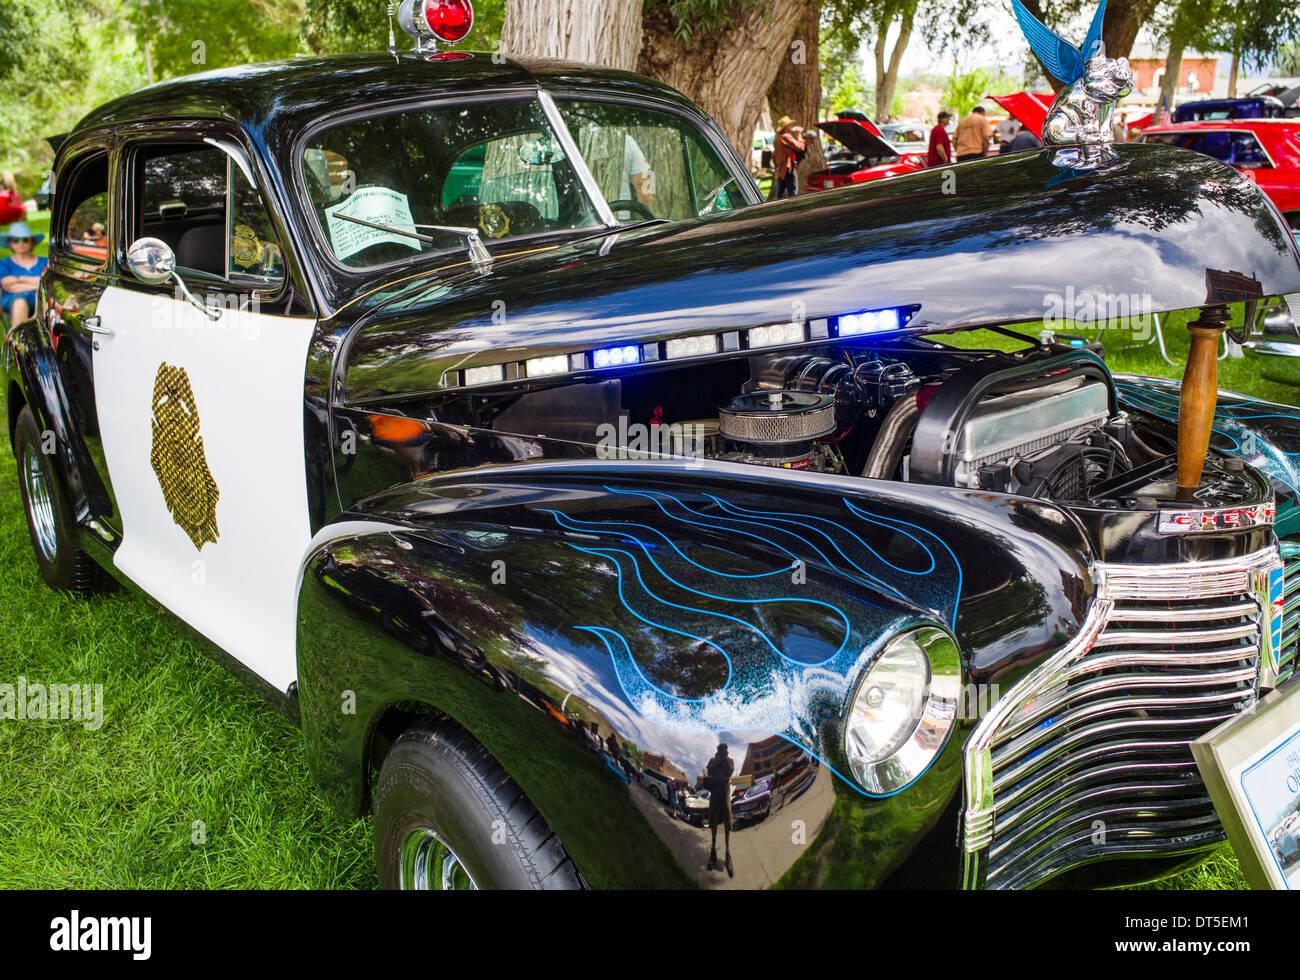 Antique Police Car Stock Photos & Antique Police Car Stock Images ...